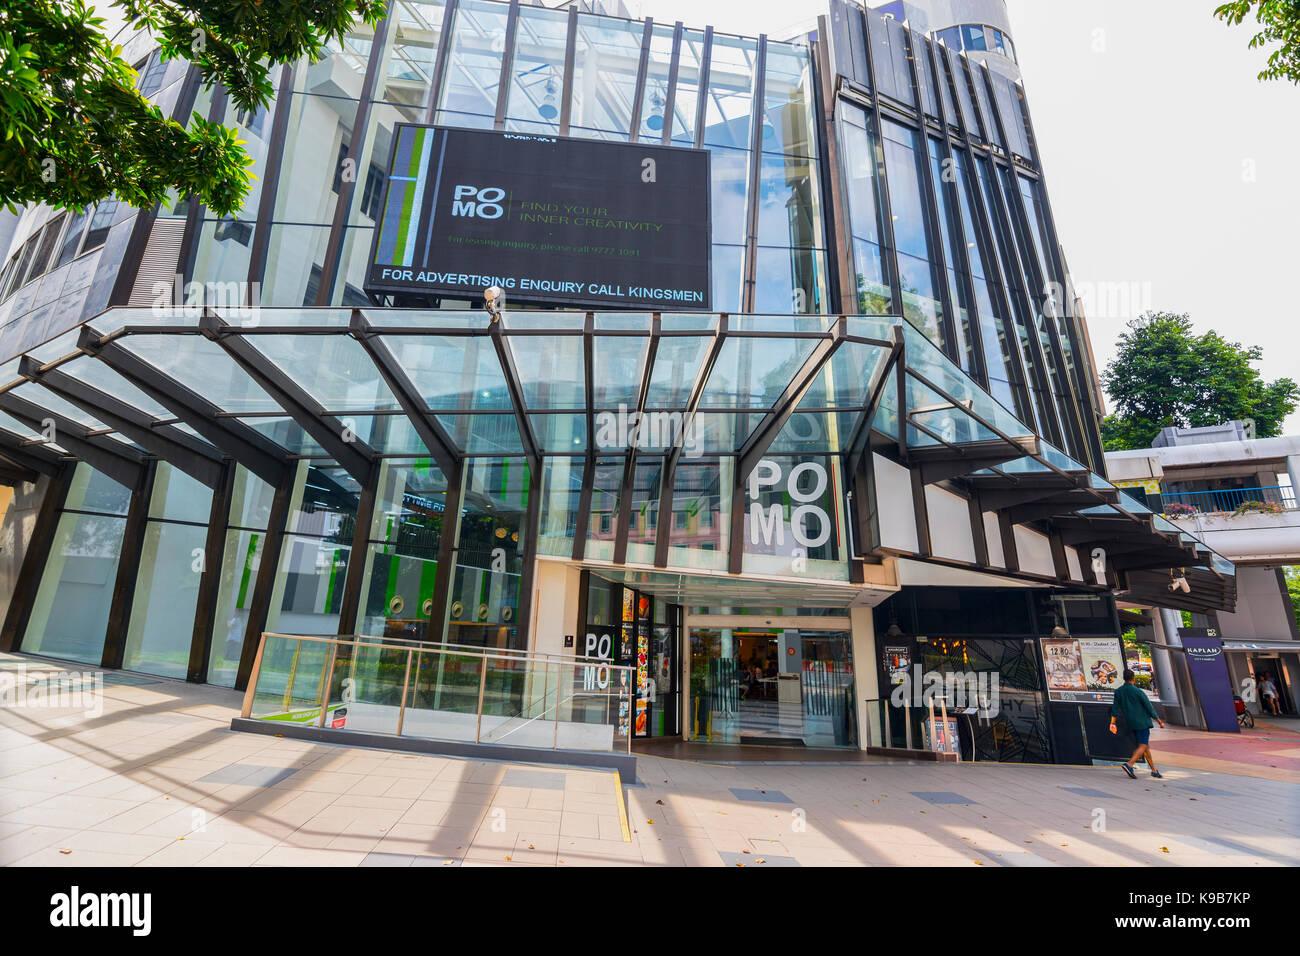 PoMo Shopping Mall, Selegie Road, Singapore - Stock Image